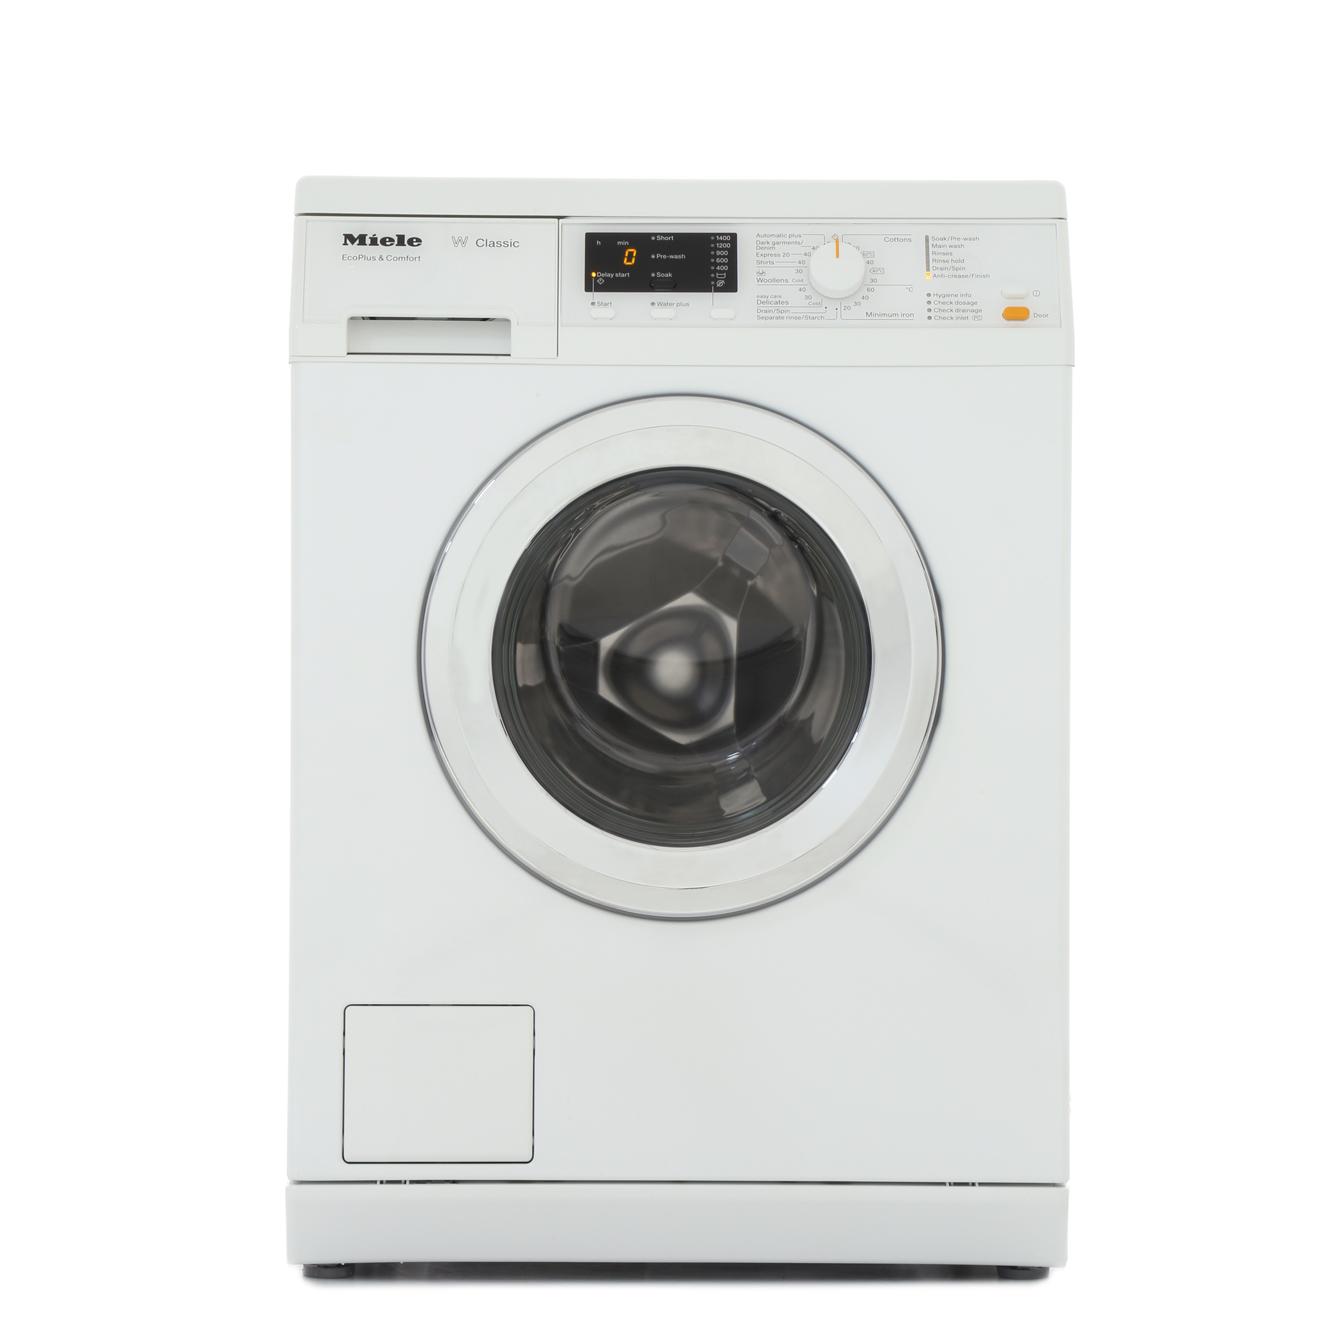 buy miele classic wda211 washing machine wda211 lotus. Black Bedroom Furniture Sets. Home Design Ideas